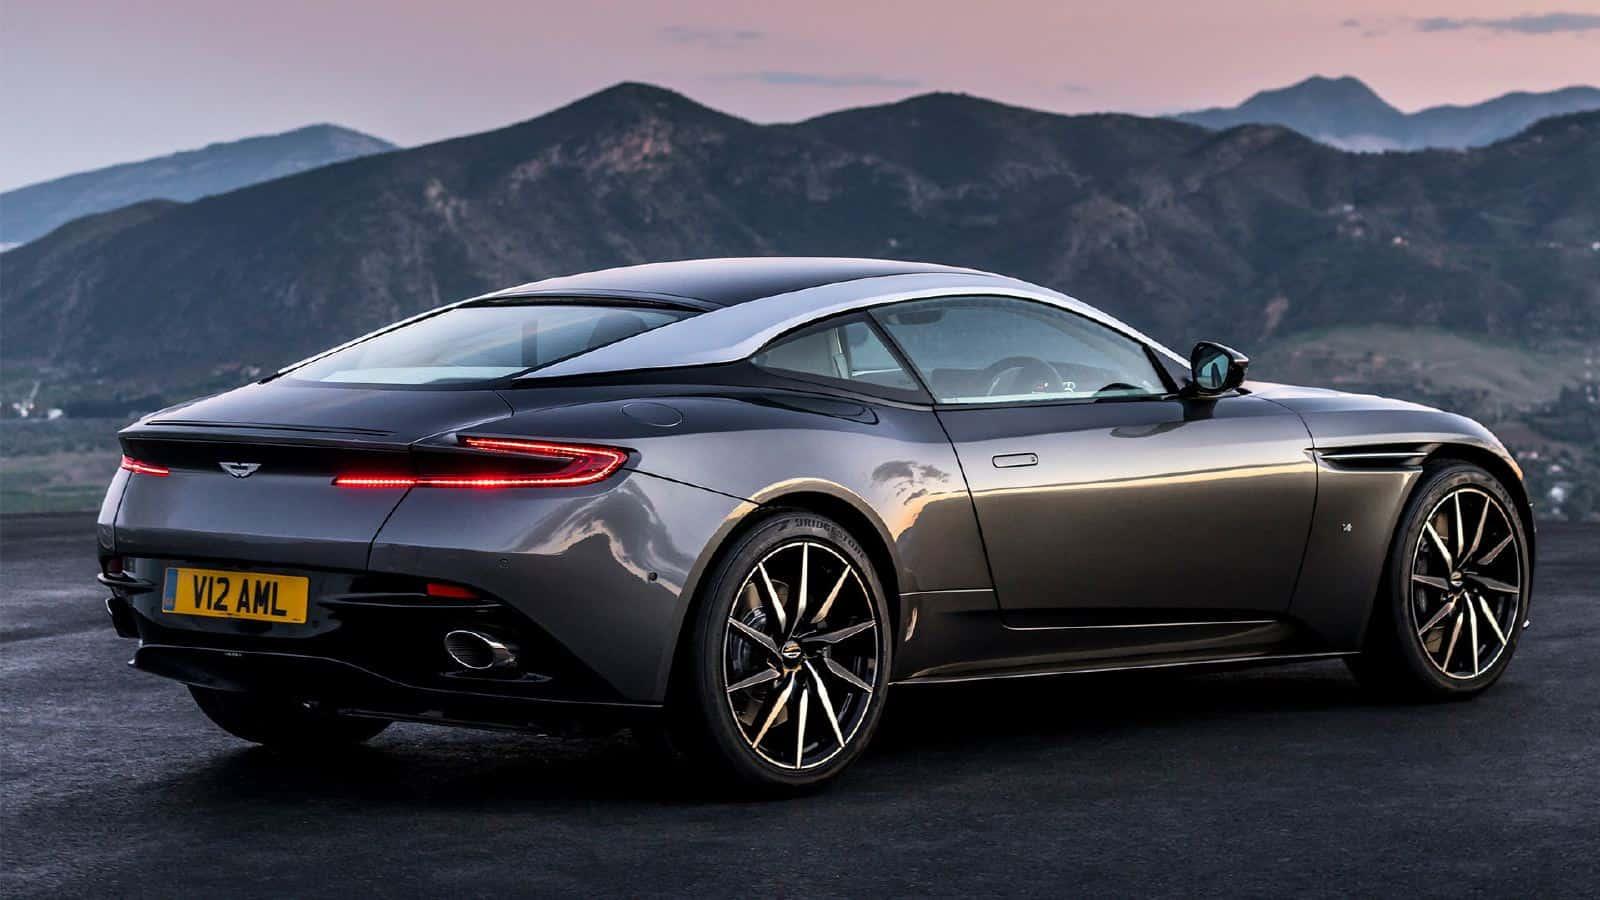 Aston Martin Db11 Embodies Firm S Second Century Plan